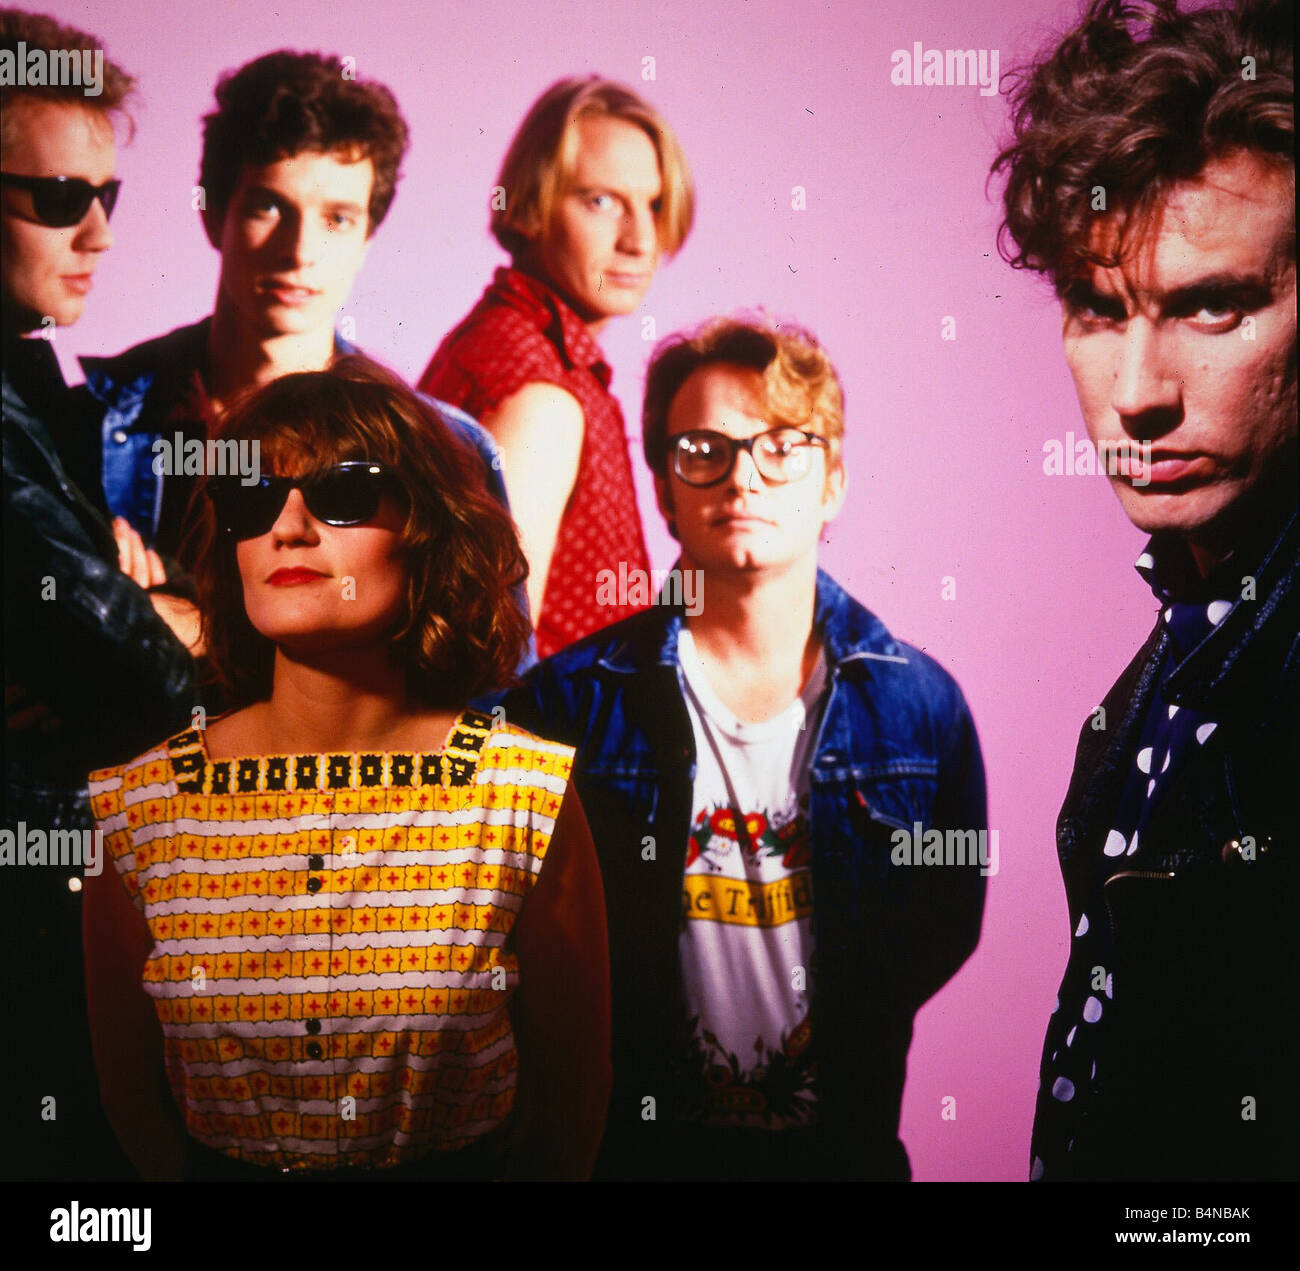 Triffids Pop Group Band Circa 1980